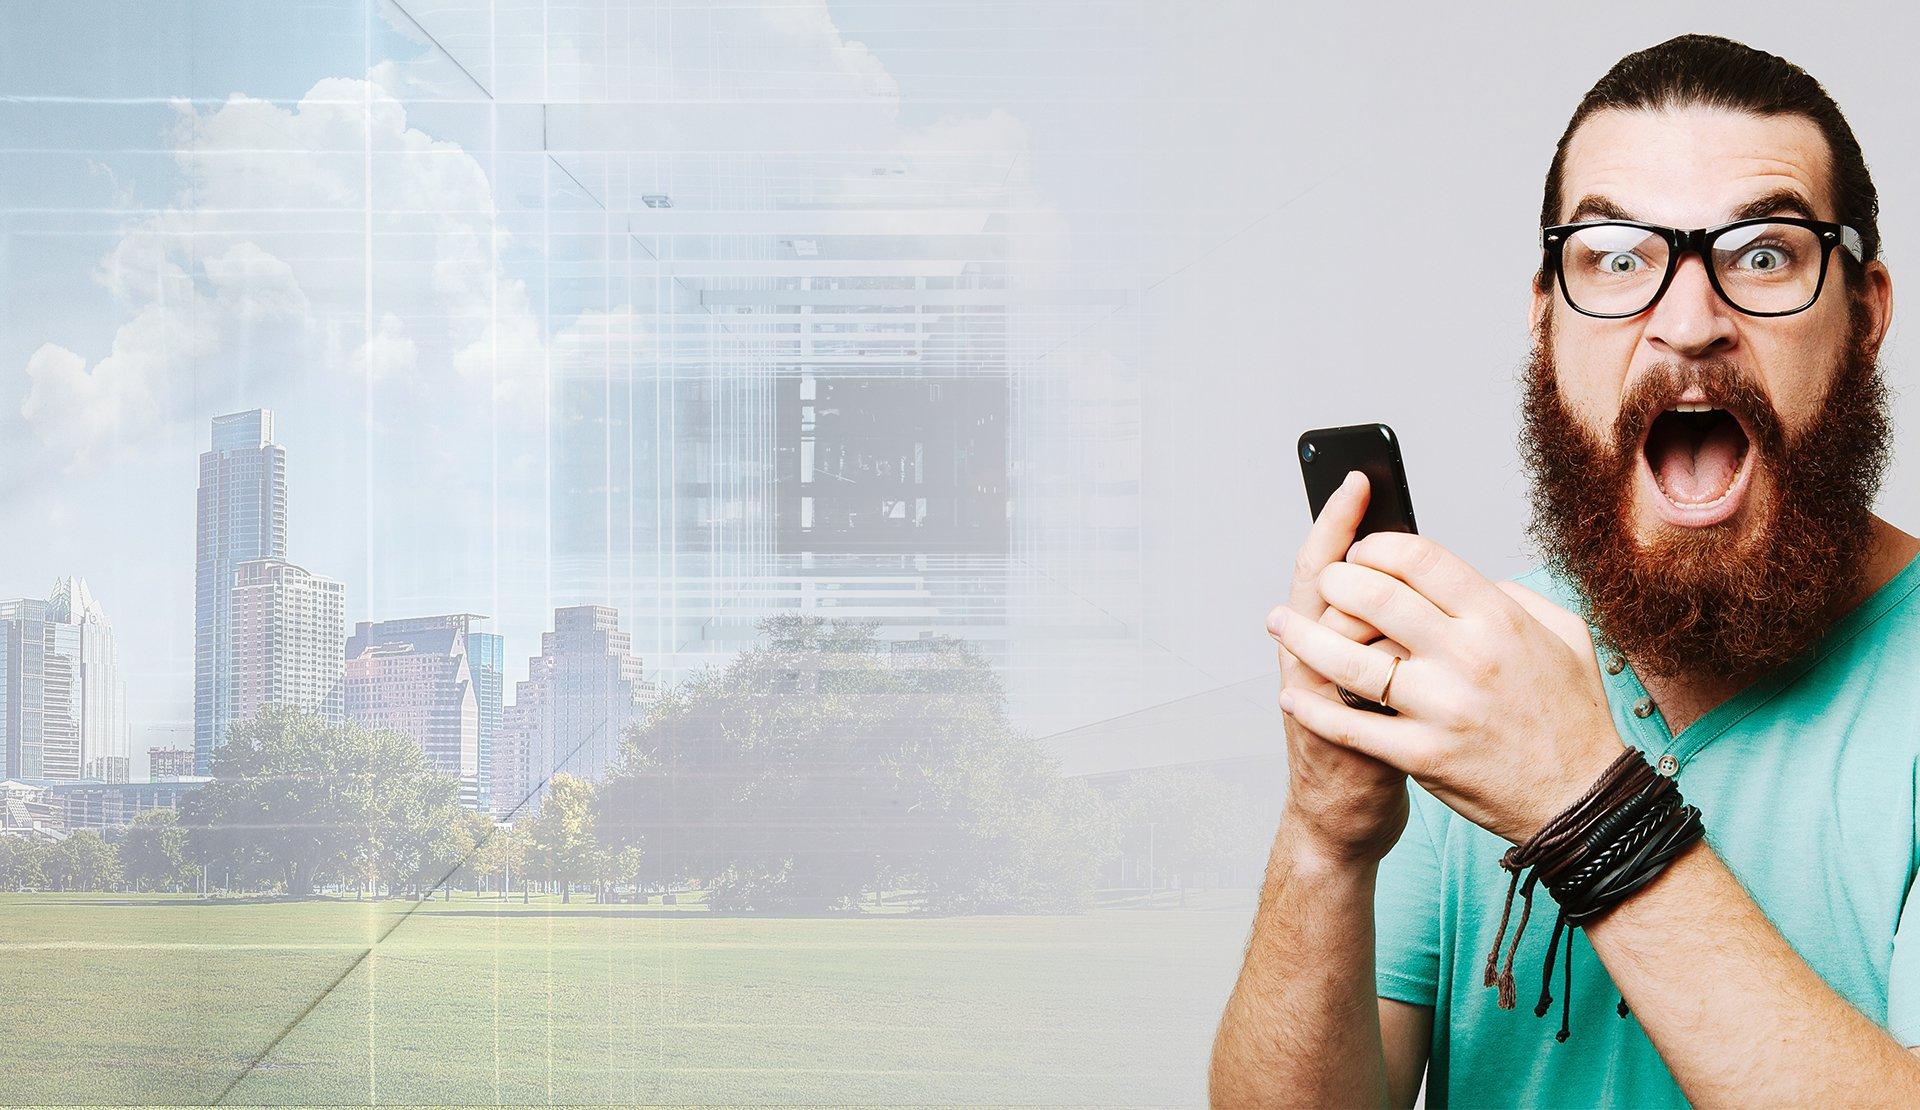 Allnet Flat im Vodafone Netz mit 6GB LTE (Mobilcom Debitel)